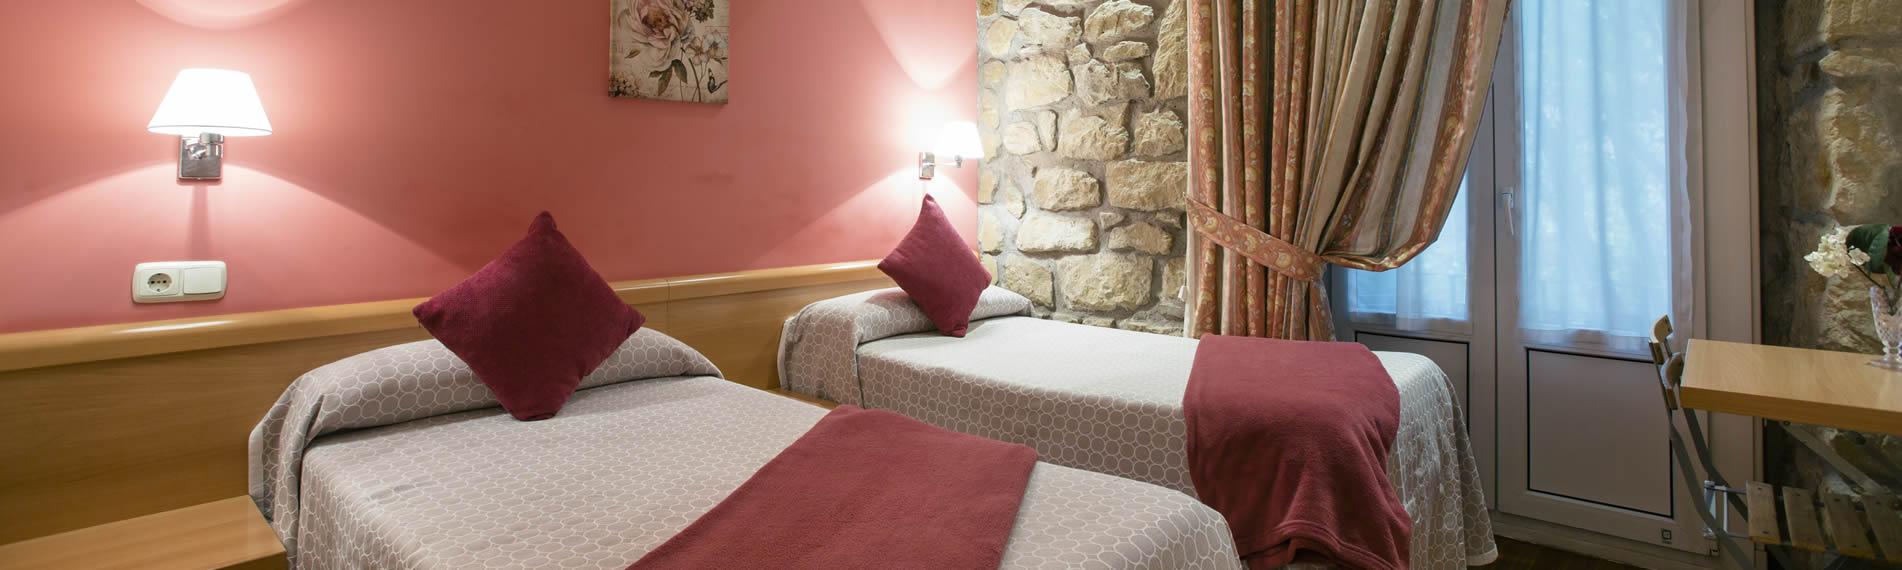 Hotel en la calle Urbieta en Donostia - San Sebastián, cerca de la playa de la concha